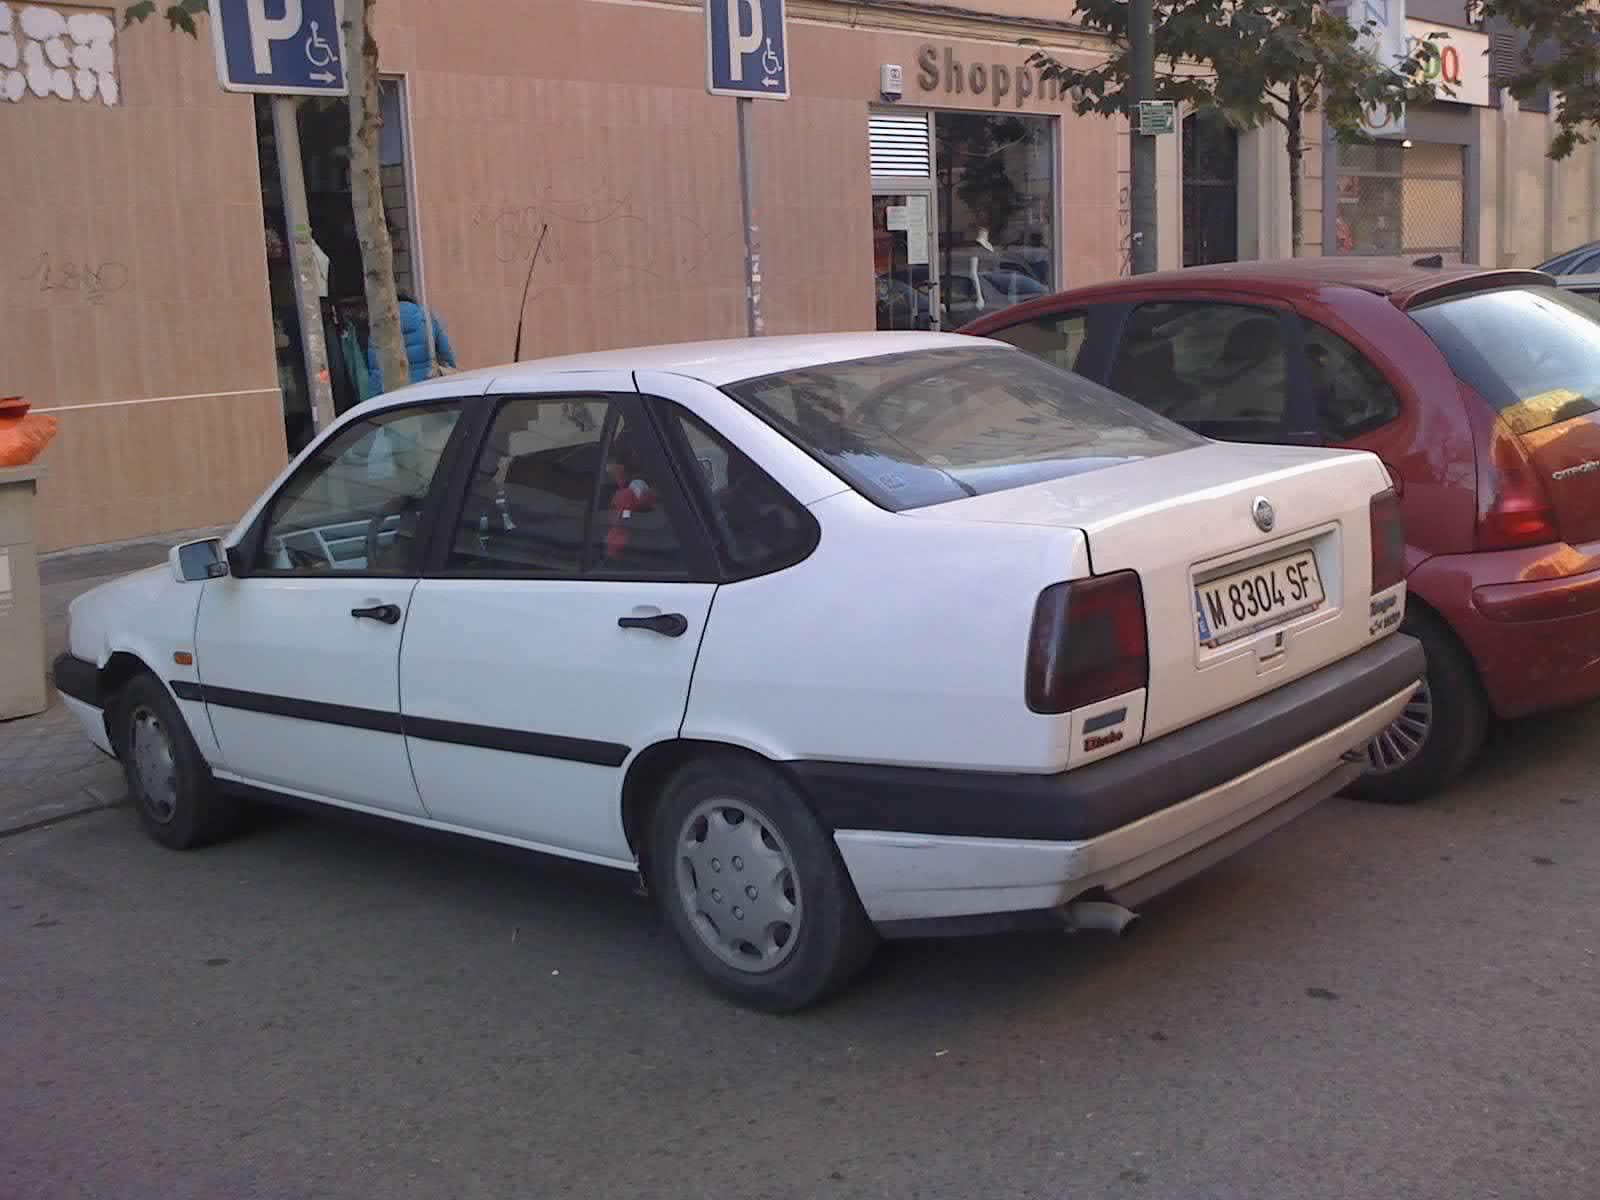 File Fiat Tempra 1 9d 24 12 06 1706 Jpg Wikimedia Commons